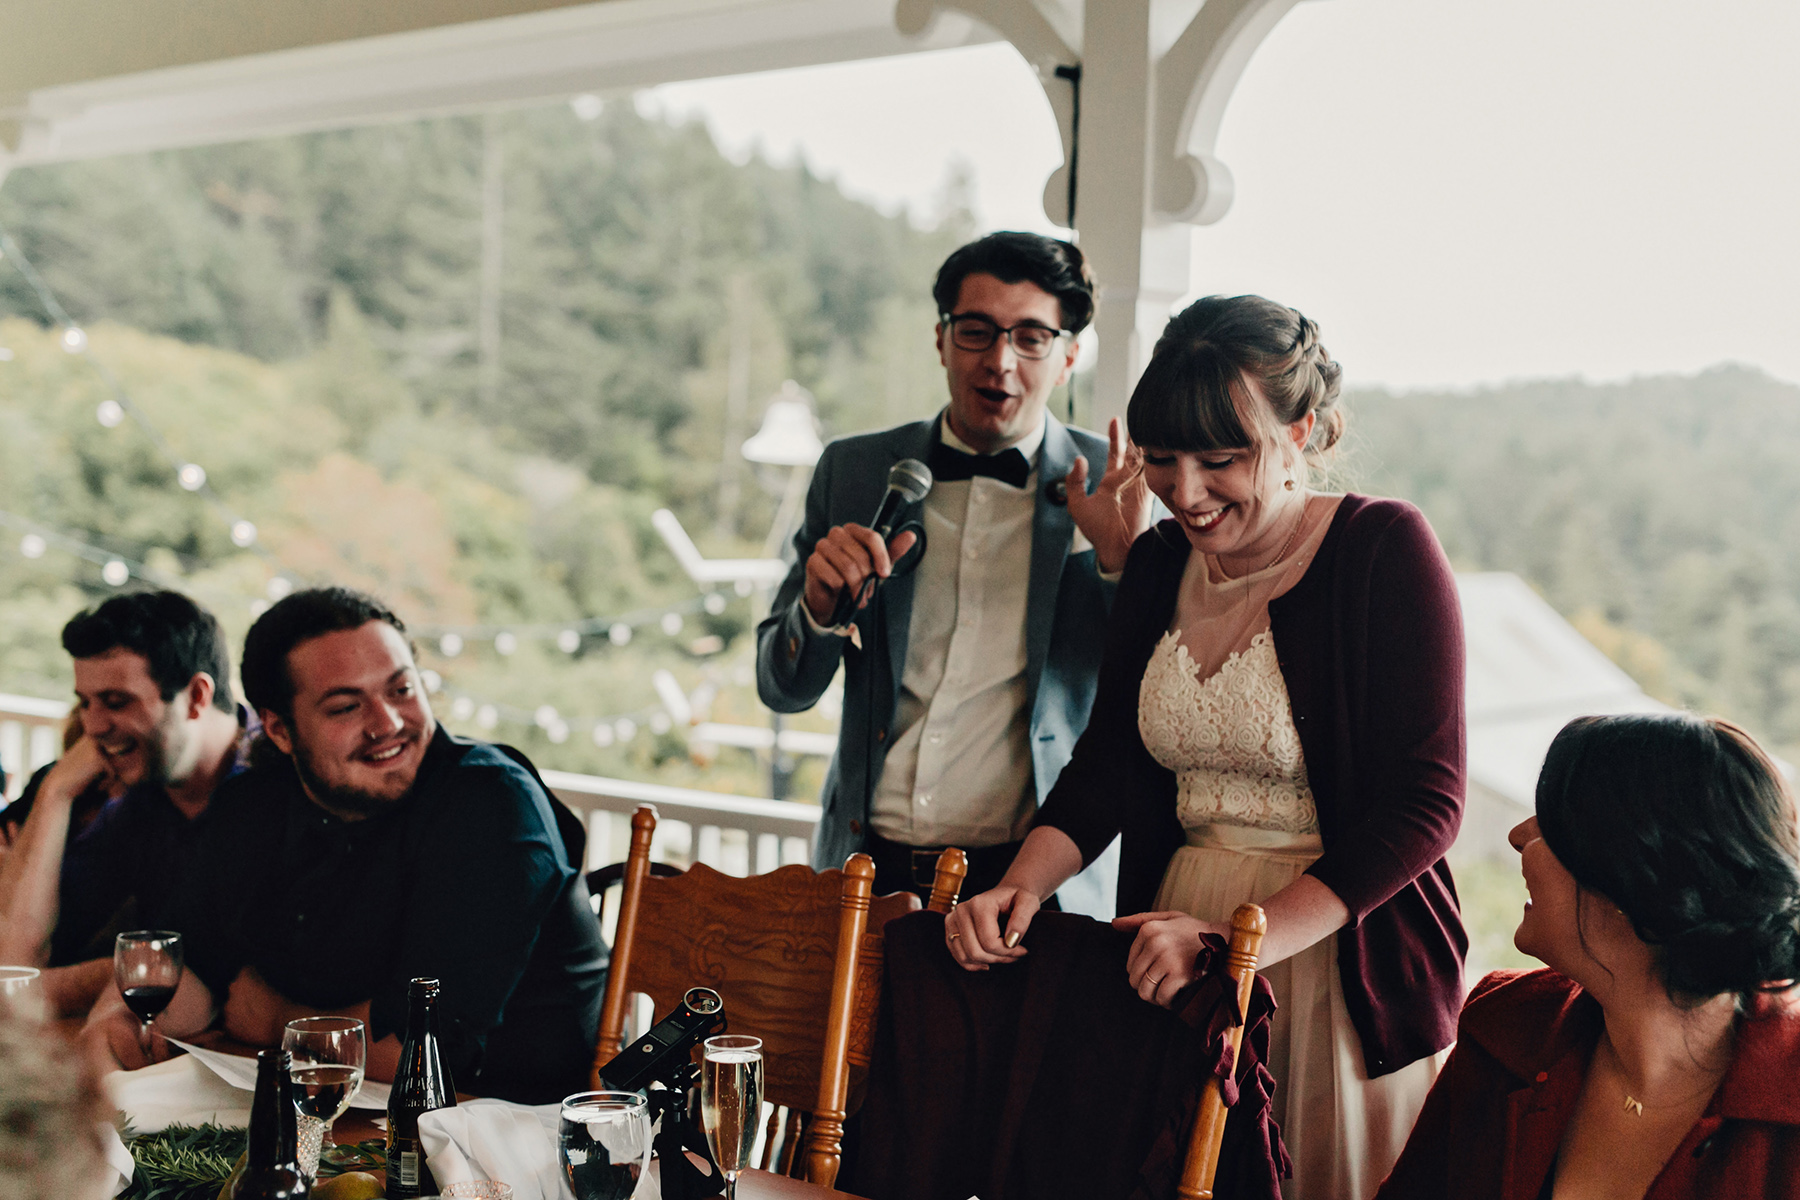 chelsea-brian-wedding-photos-0012.jpg